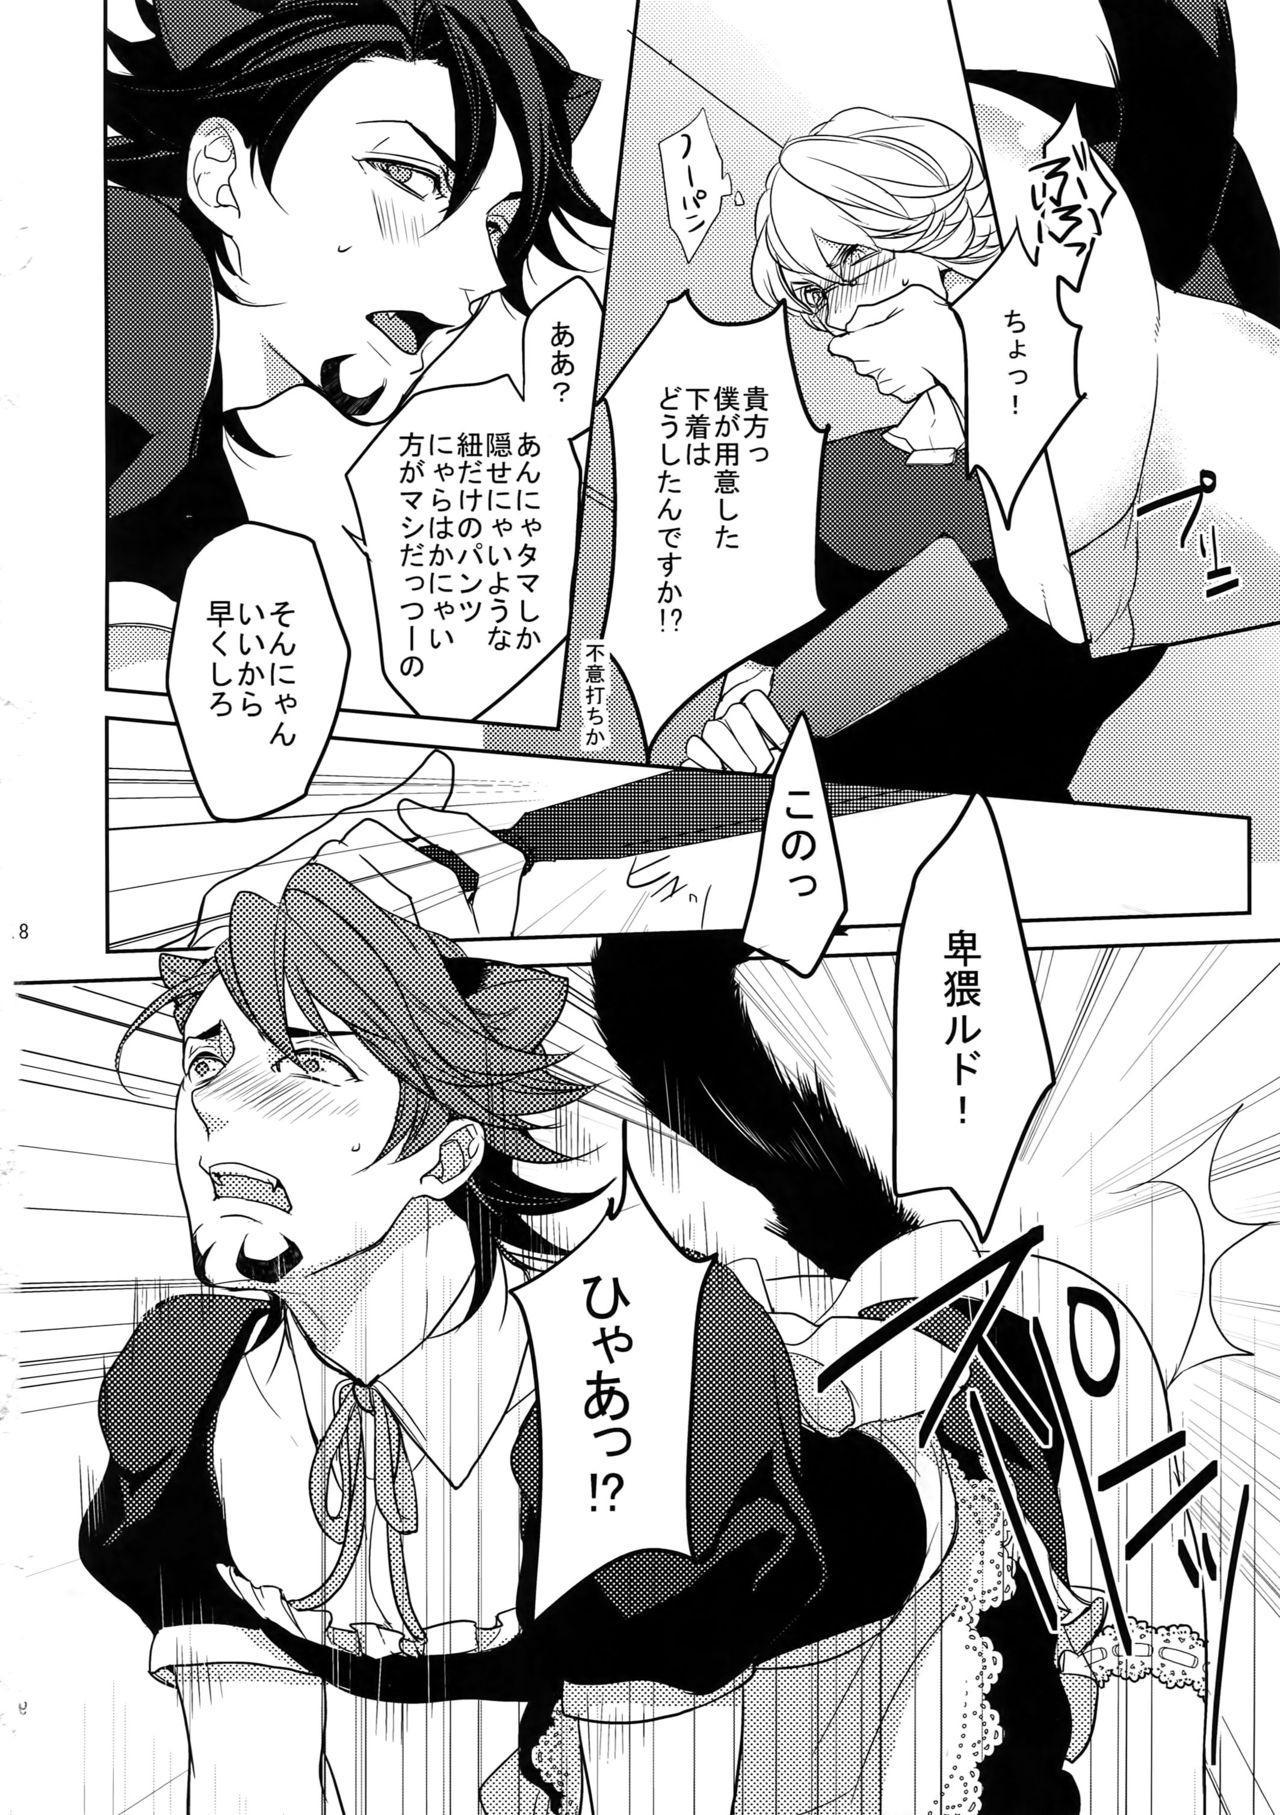 BOROZS Usagi Tora Sairoku 2 16